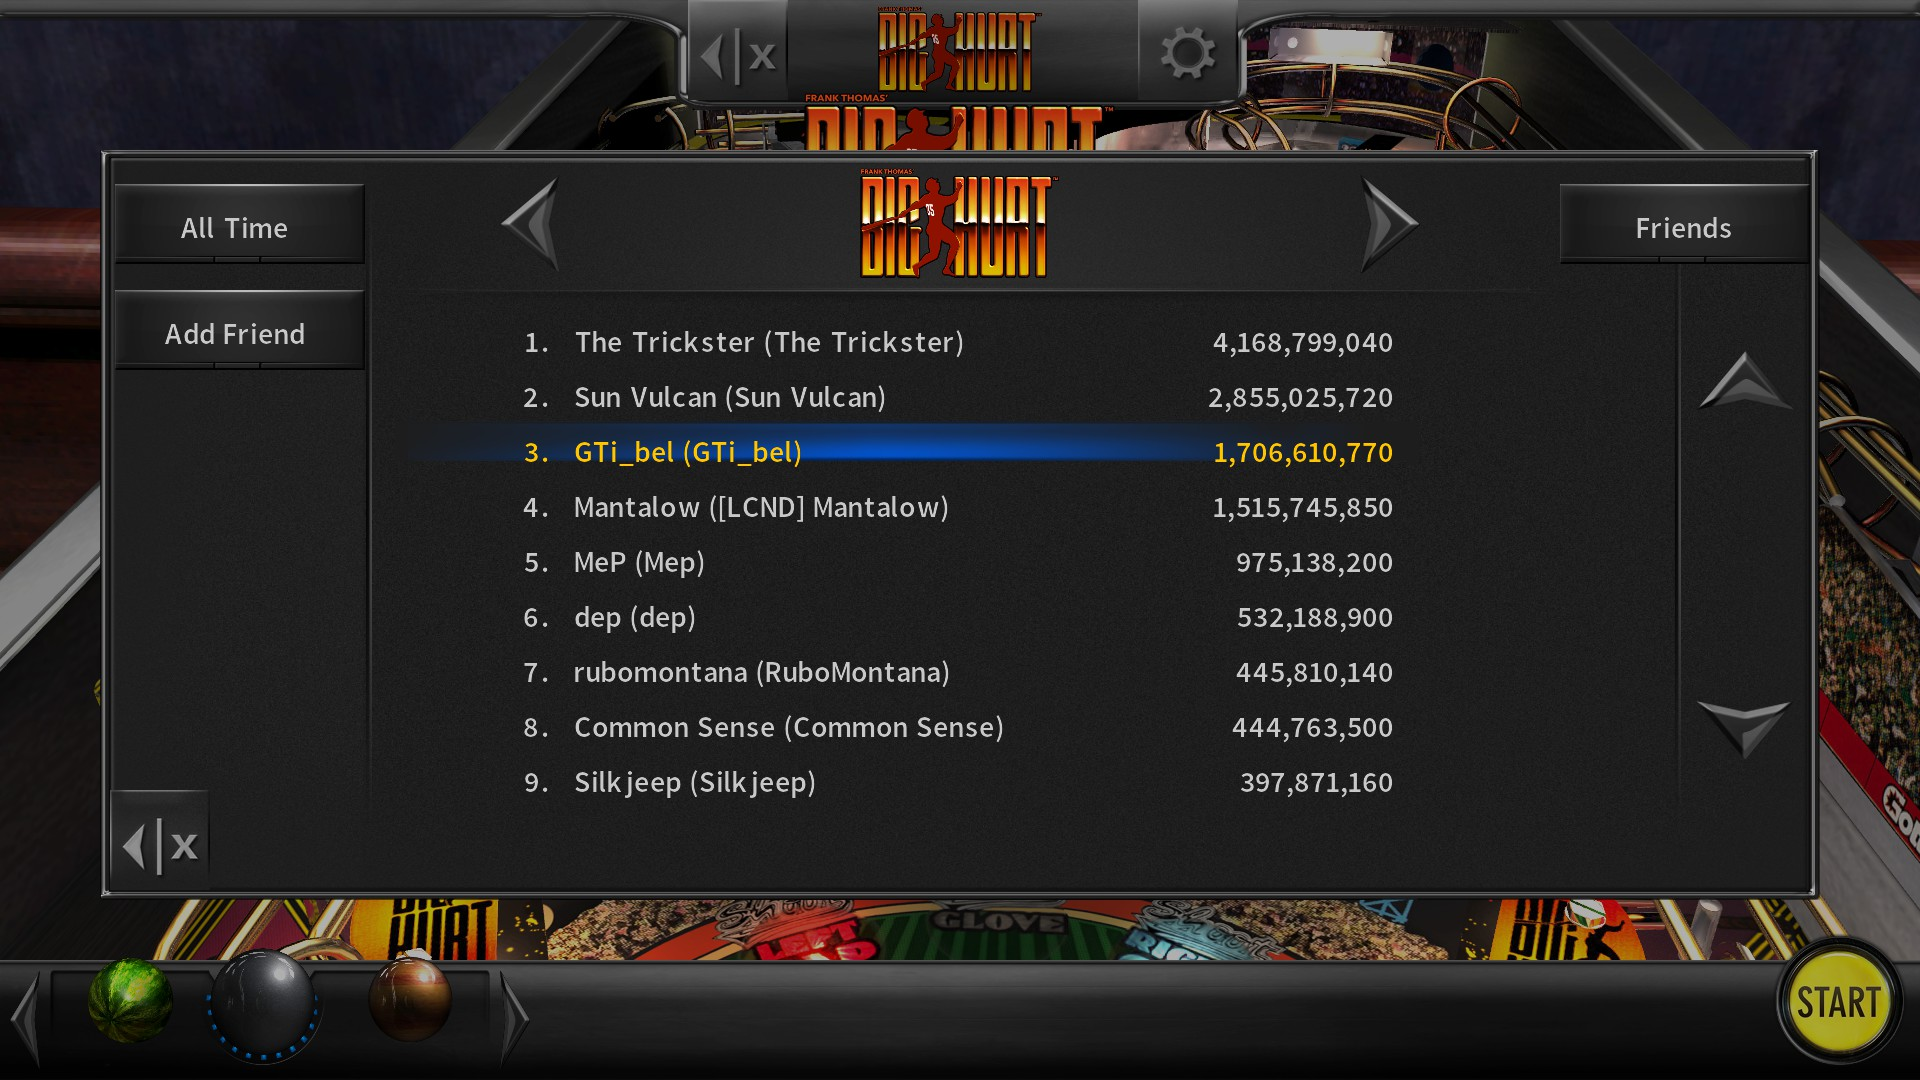 GTibel: Pinball Arcade: Big Hurt (PC) 1,706,610,770 points on 2018-07-25 11:44:01